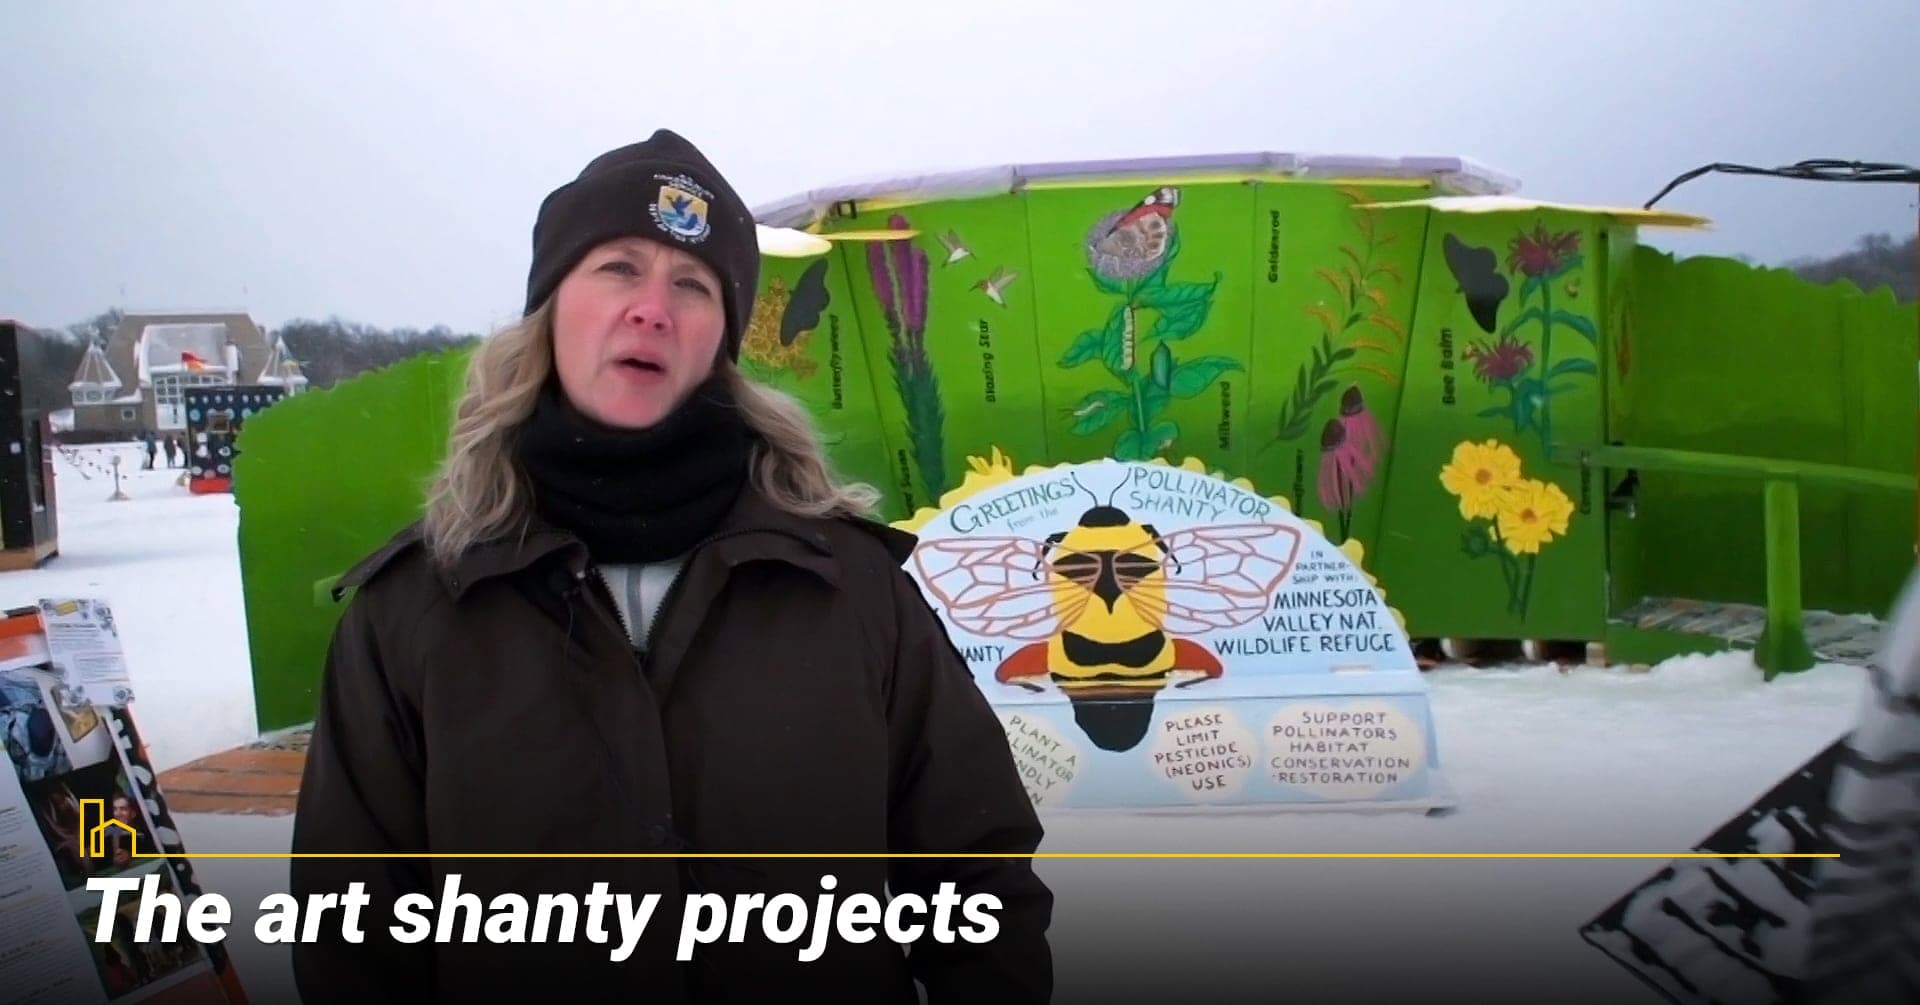 The art shanty projects, many art projects